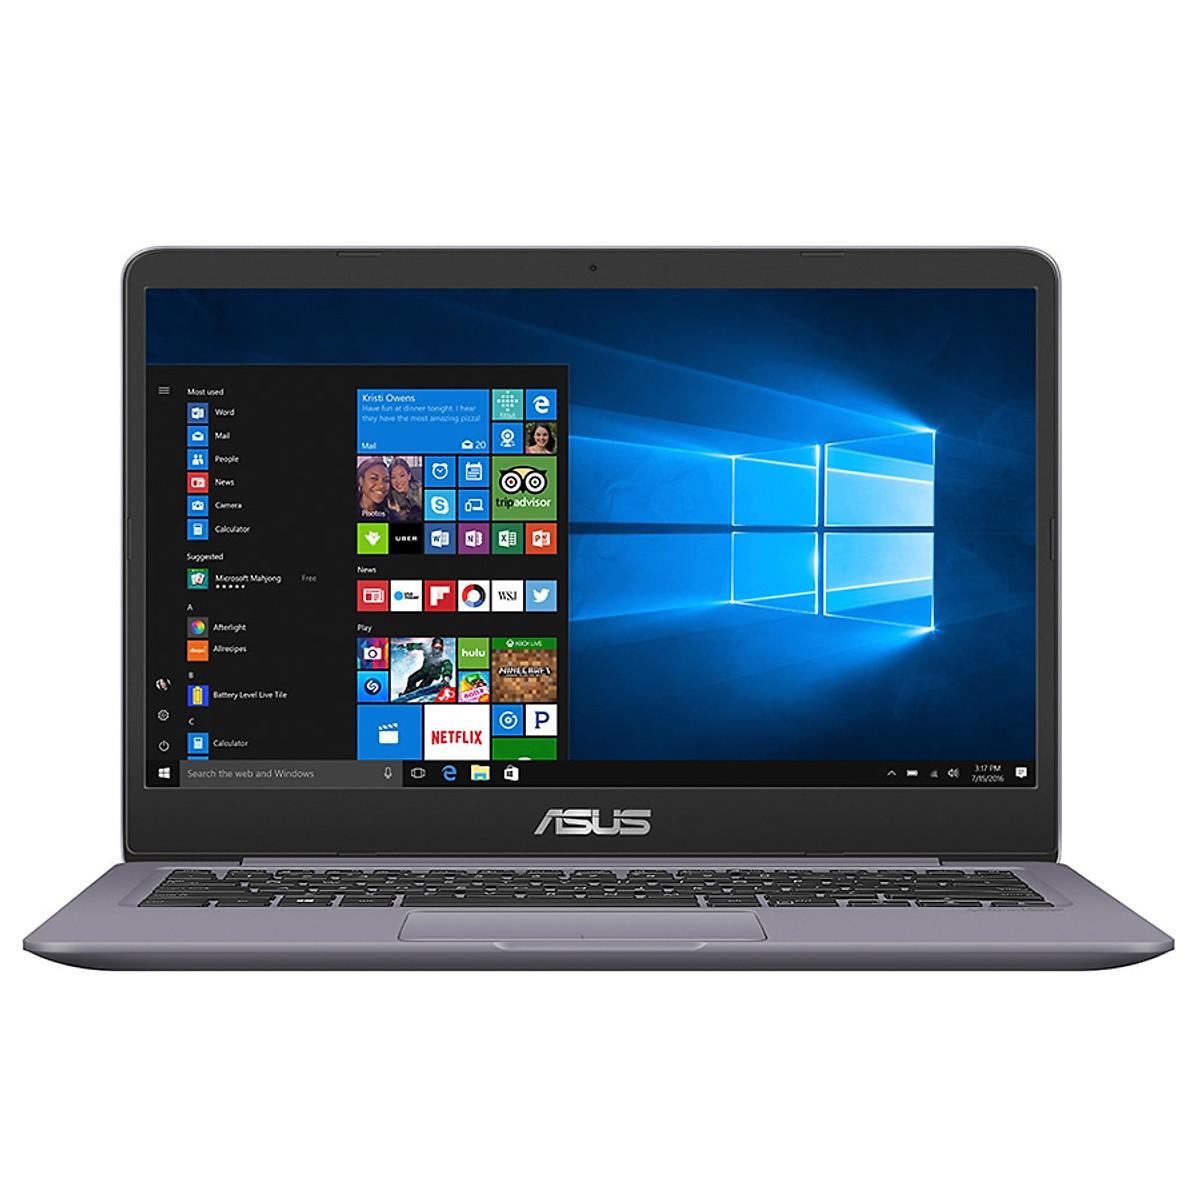 Asus   Máy tính xách tay - Laptop    Laptop Asus VivoBook 14 A411UA-EB872T Core i3-7020U/ Win10 (14